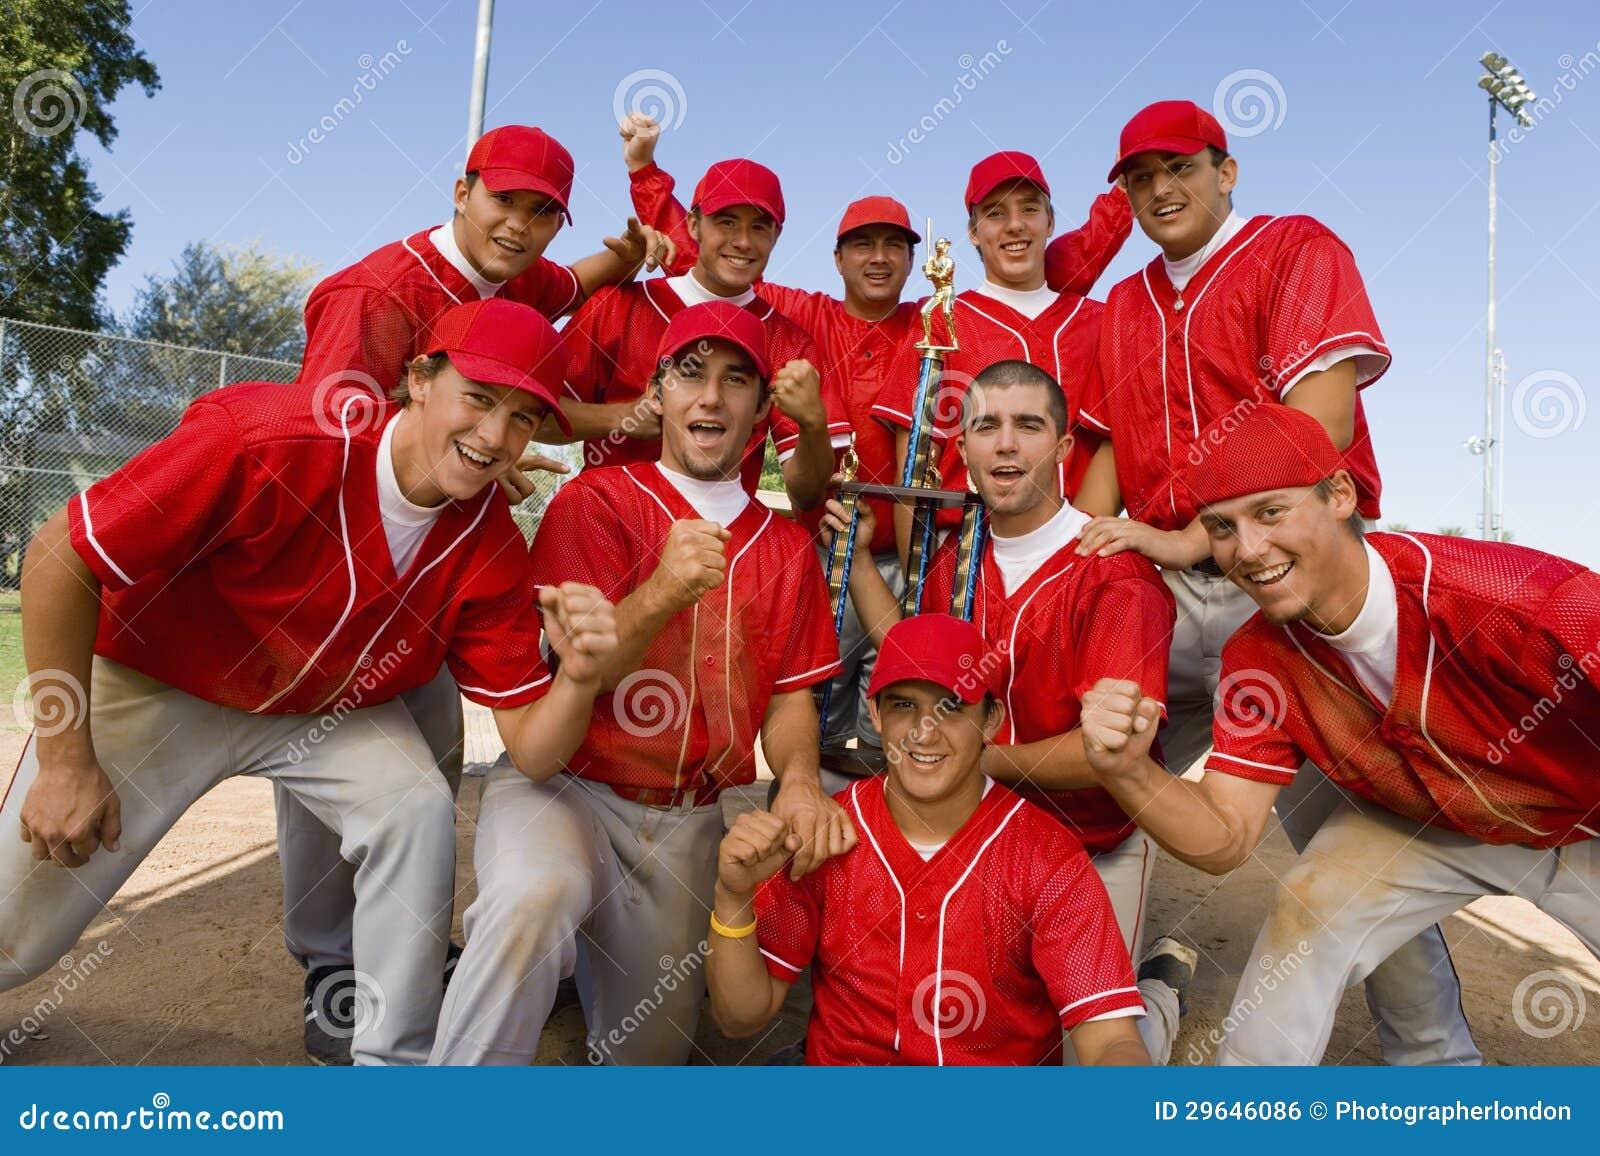 Equipa de beisebol Excited